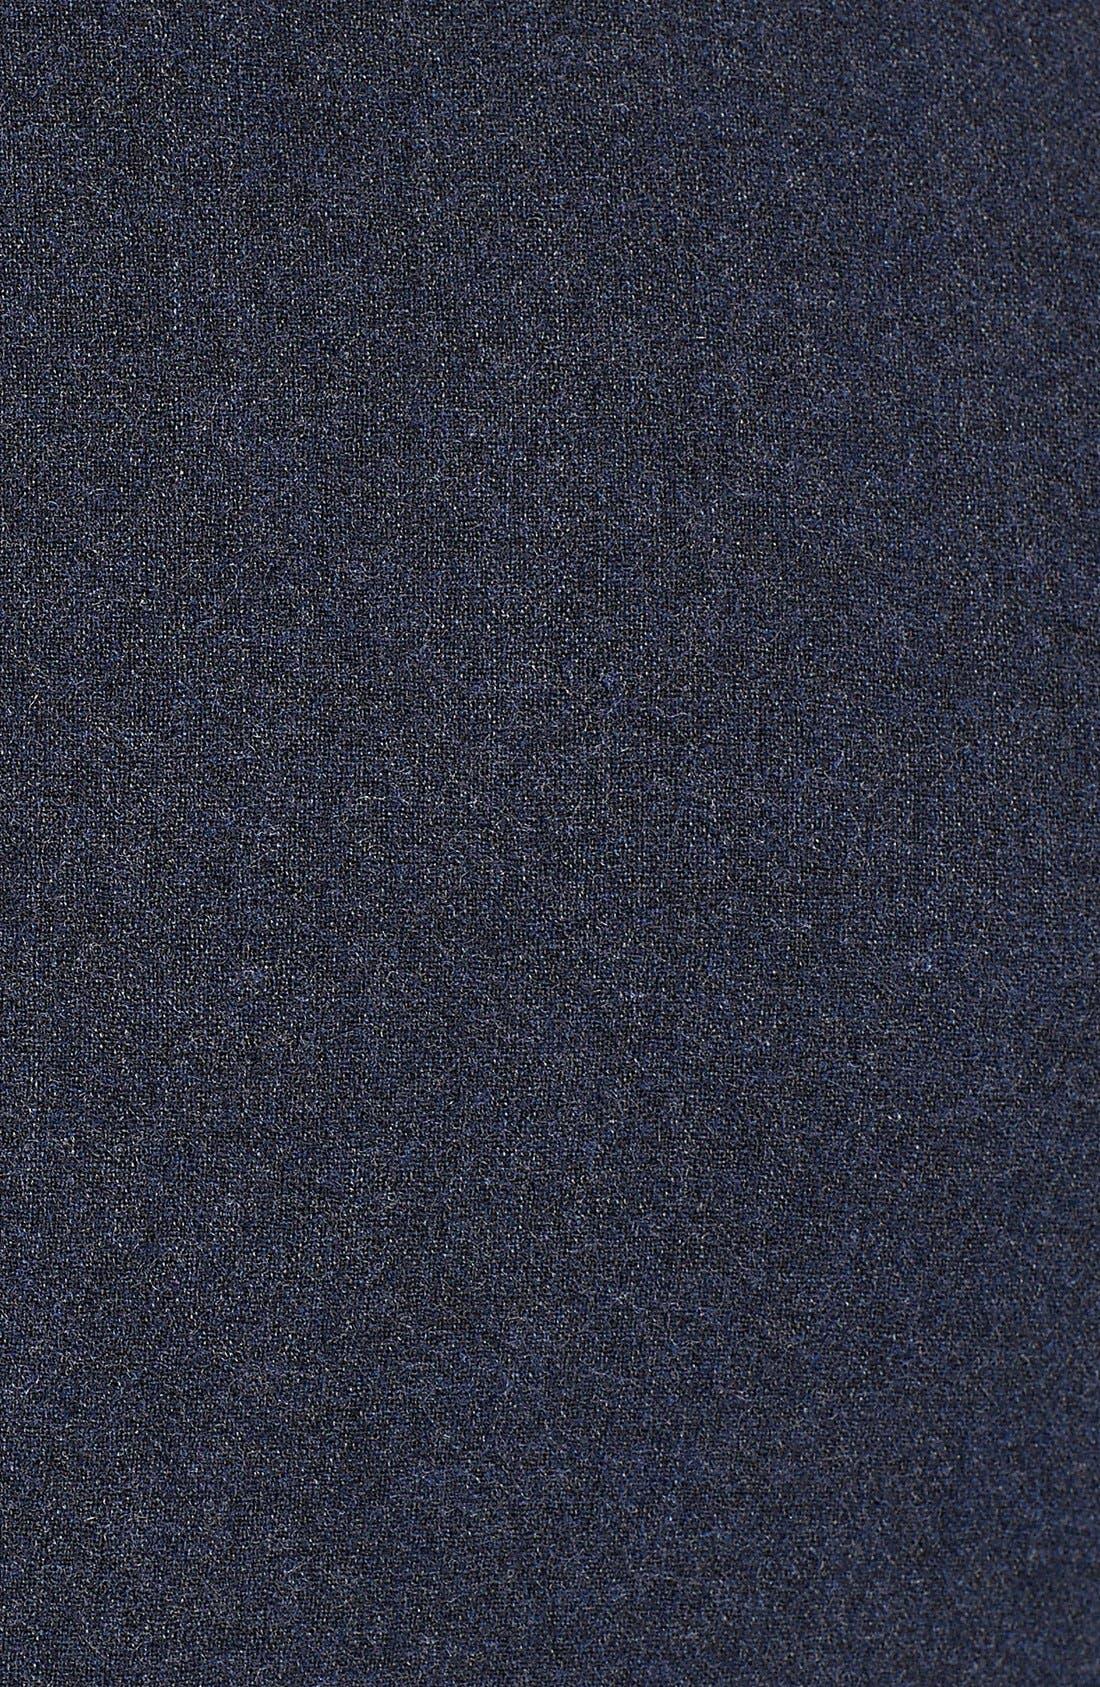 'Schoolboy' Blazer,                             Alternate thumbnail 3, color,                             462